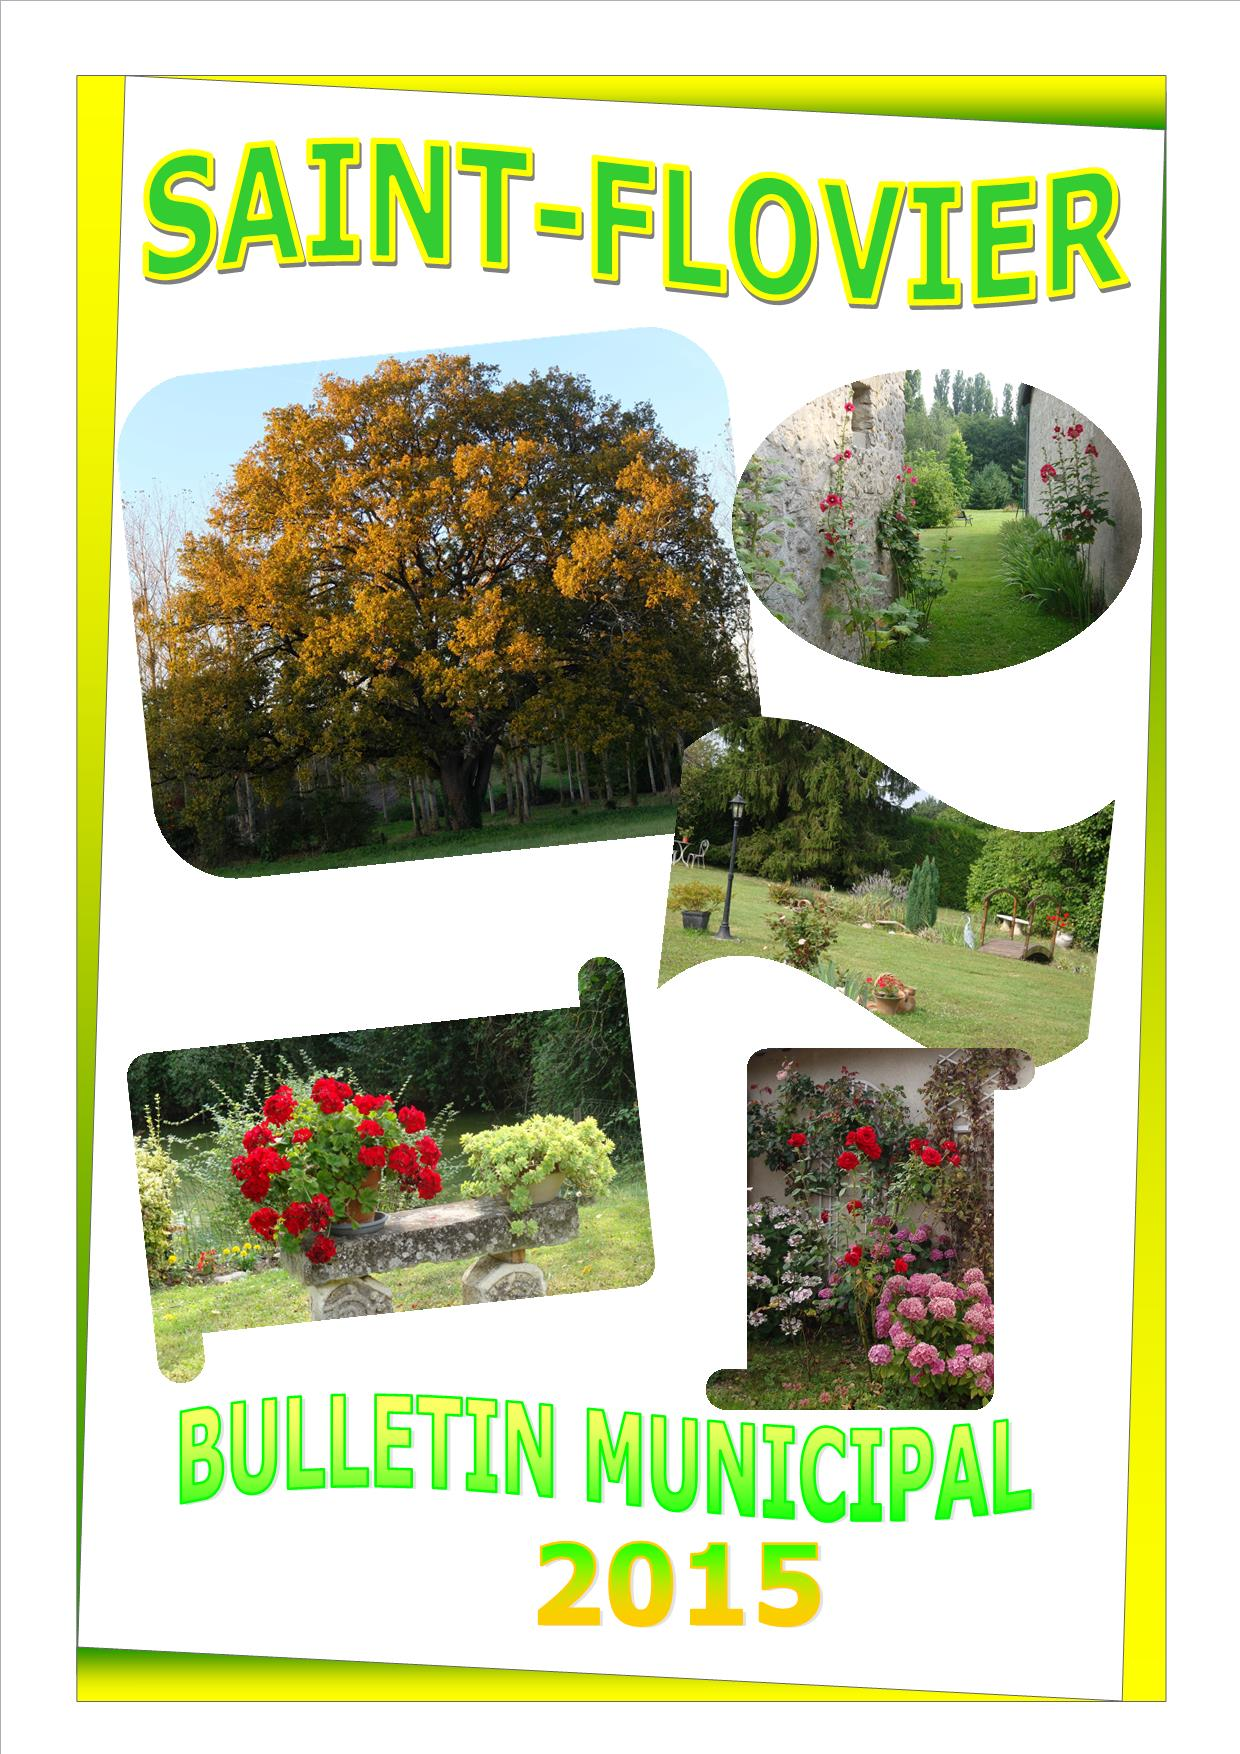 bulletins-municipaux/page-bulletin-2015.jpg